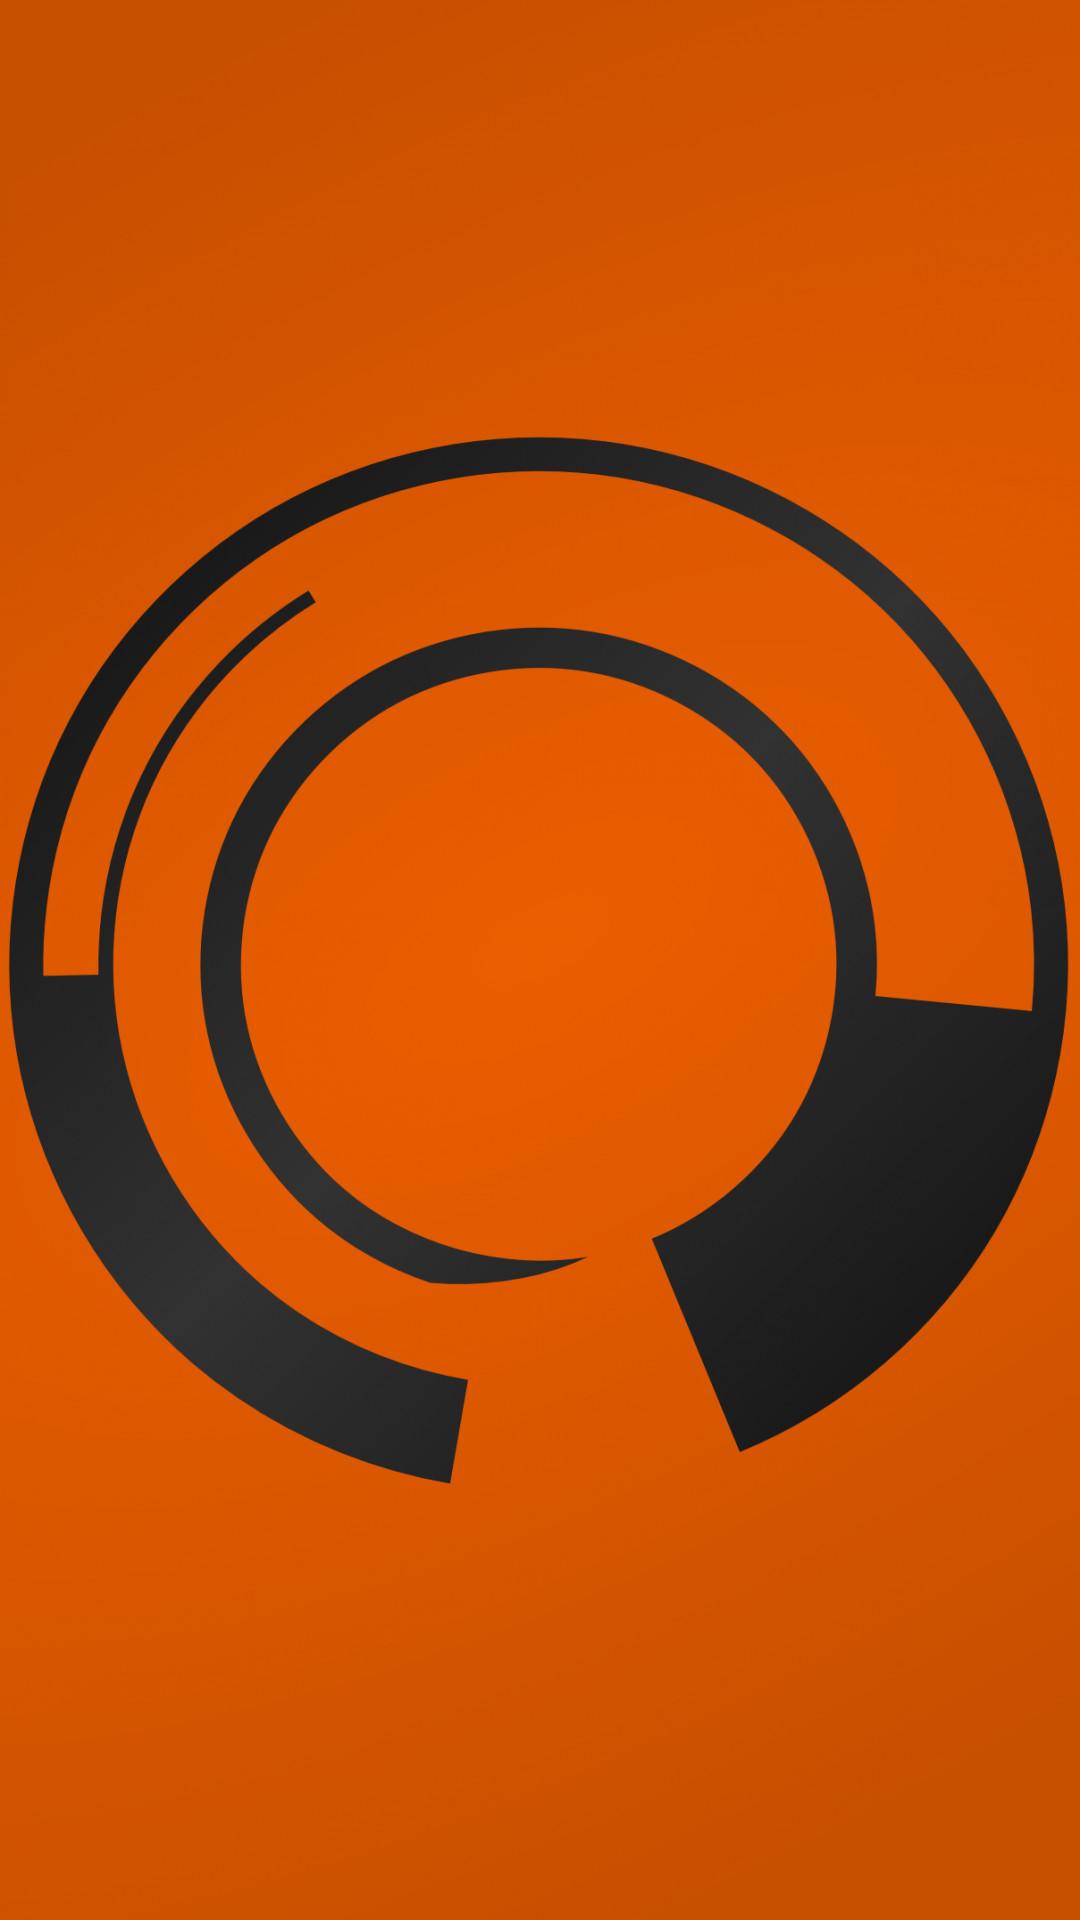 Abstract Orange Shapes. Wallpaper 424789